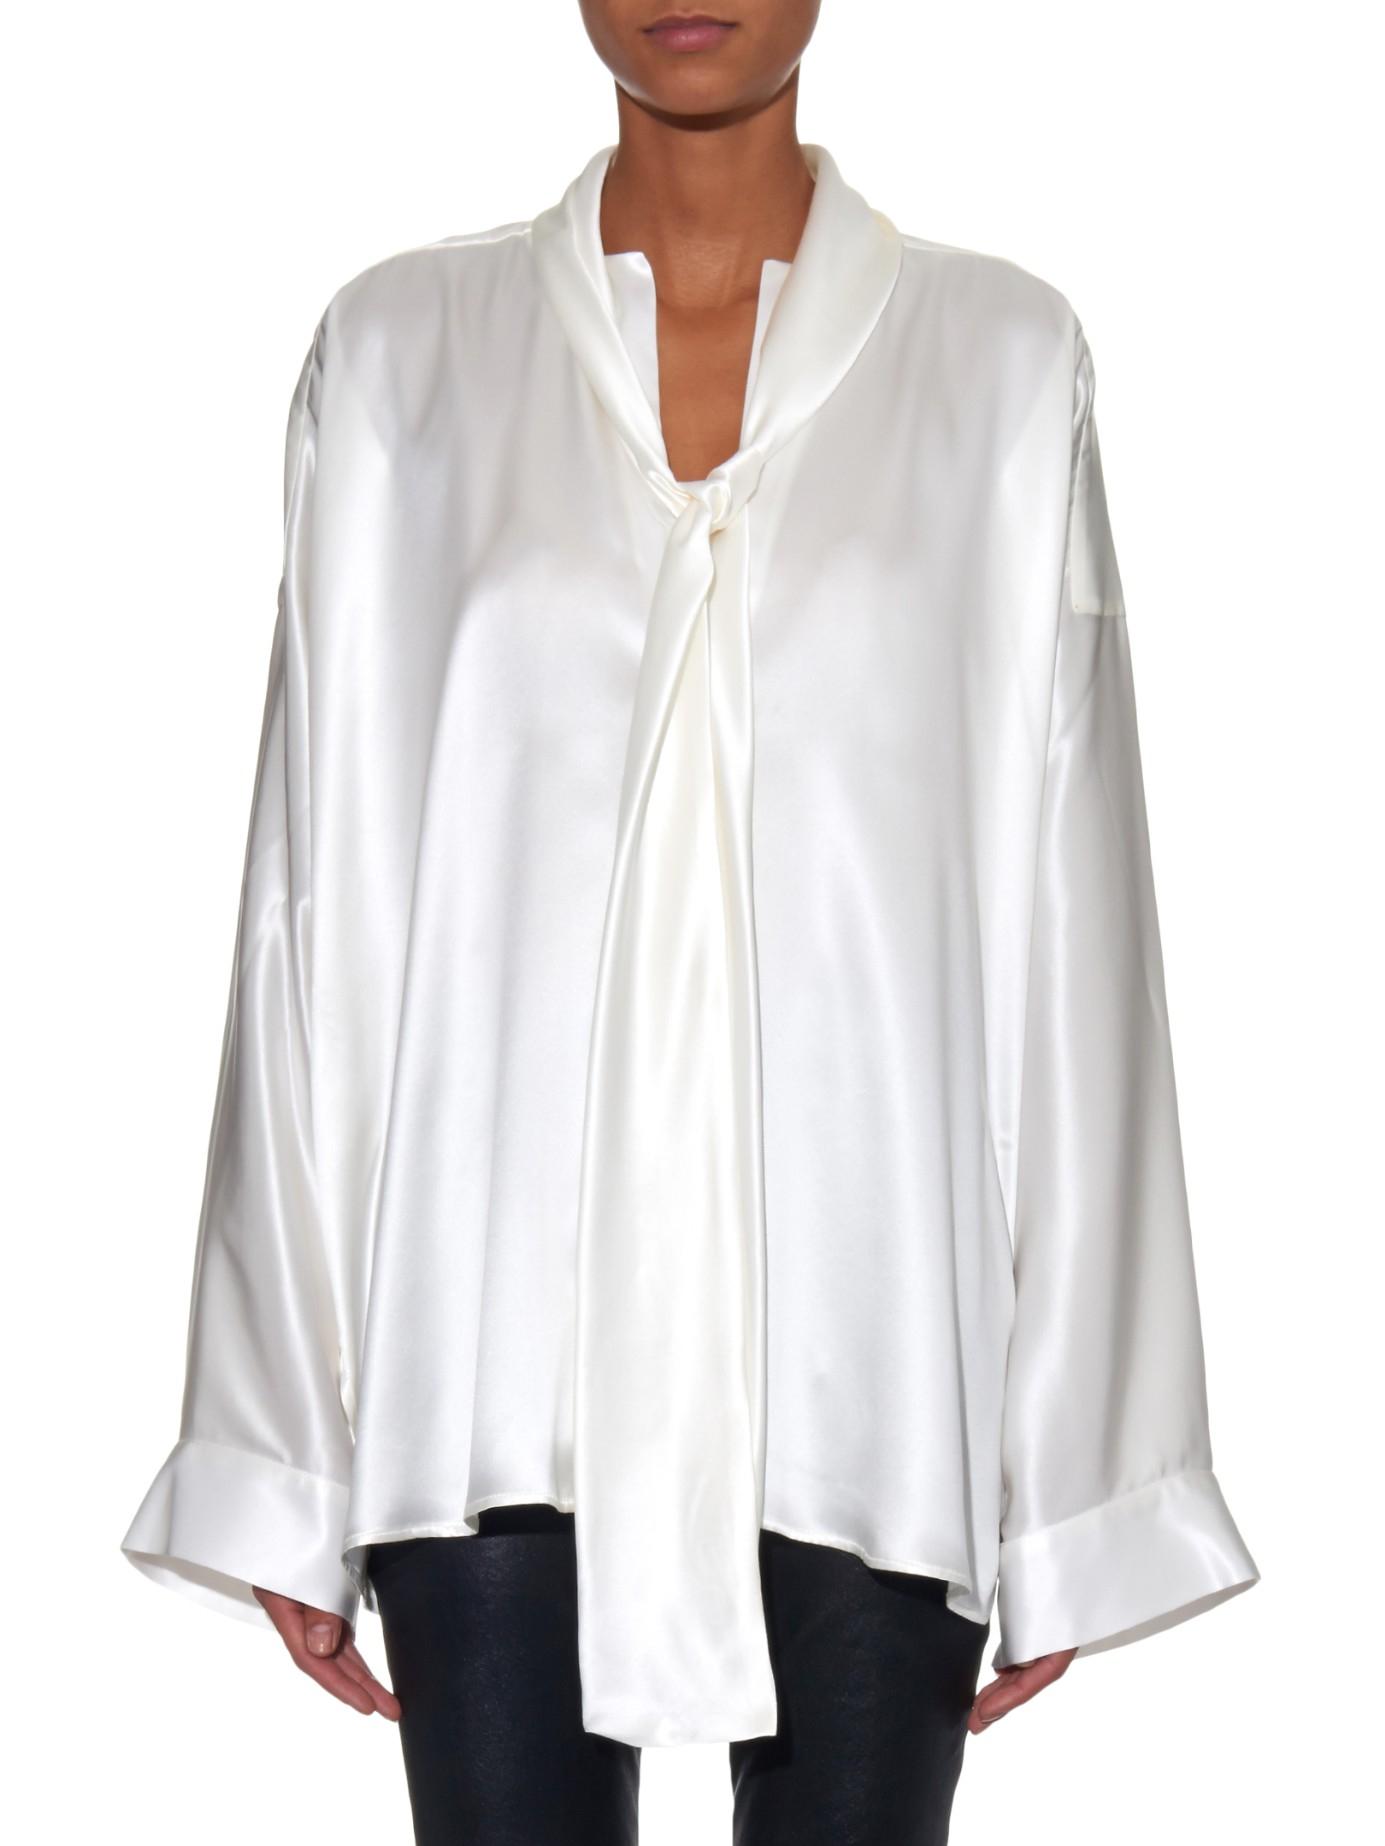 968eaffe7d41dc Haider Ackermann Scarf-collar Silk-satin Blouse in White - Lyst